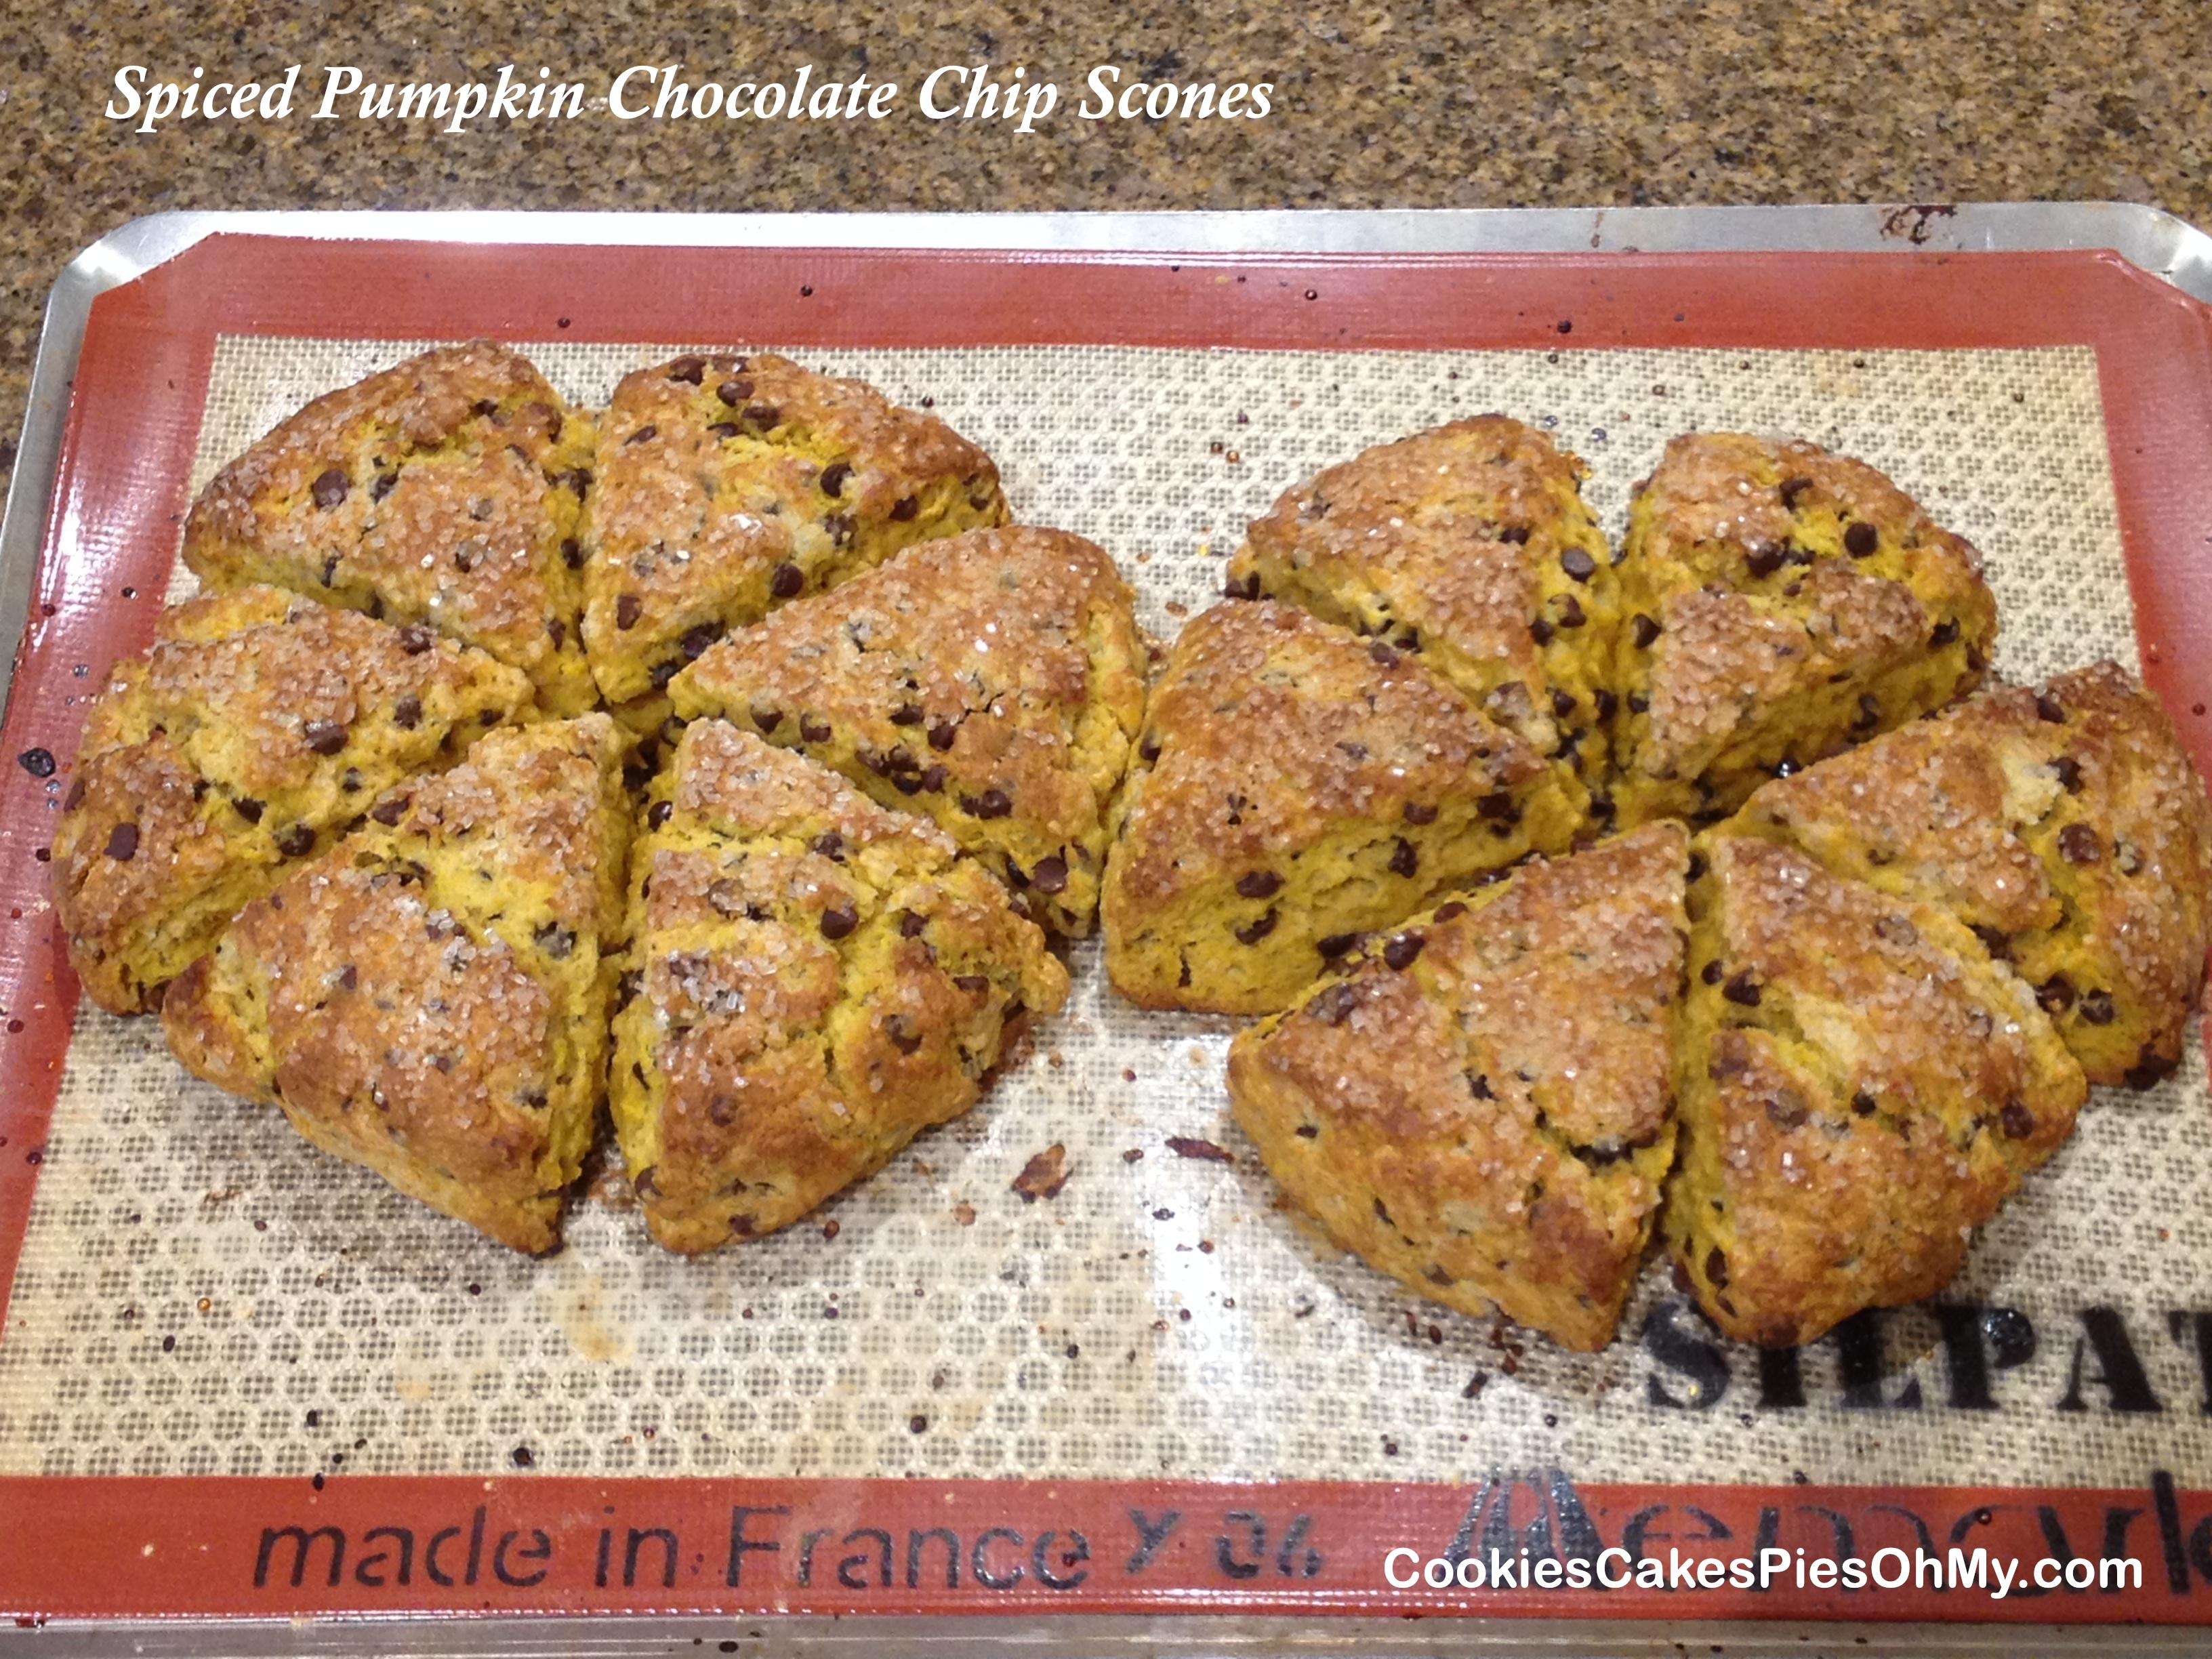 Spiced Pumpkin Chocolate Chip Scones | CookiesCakesPiesOhMy